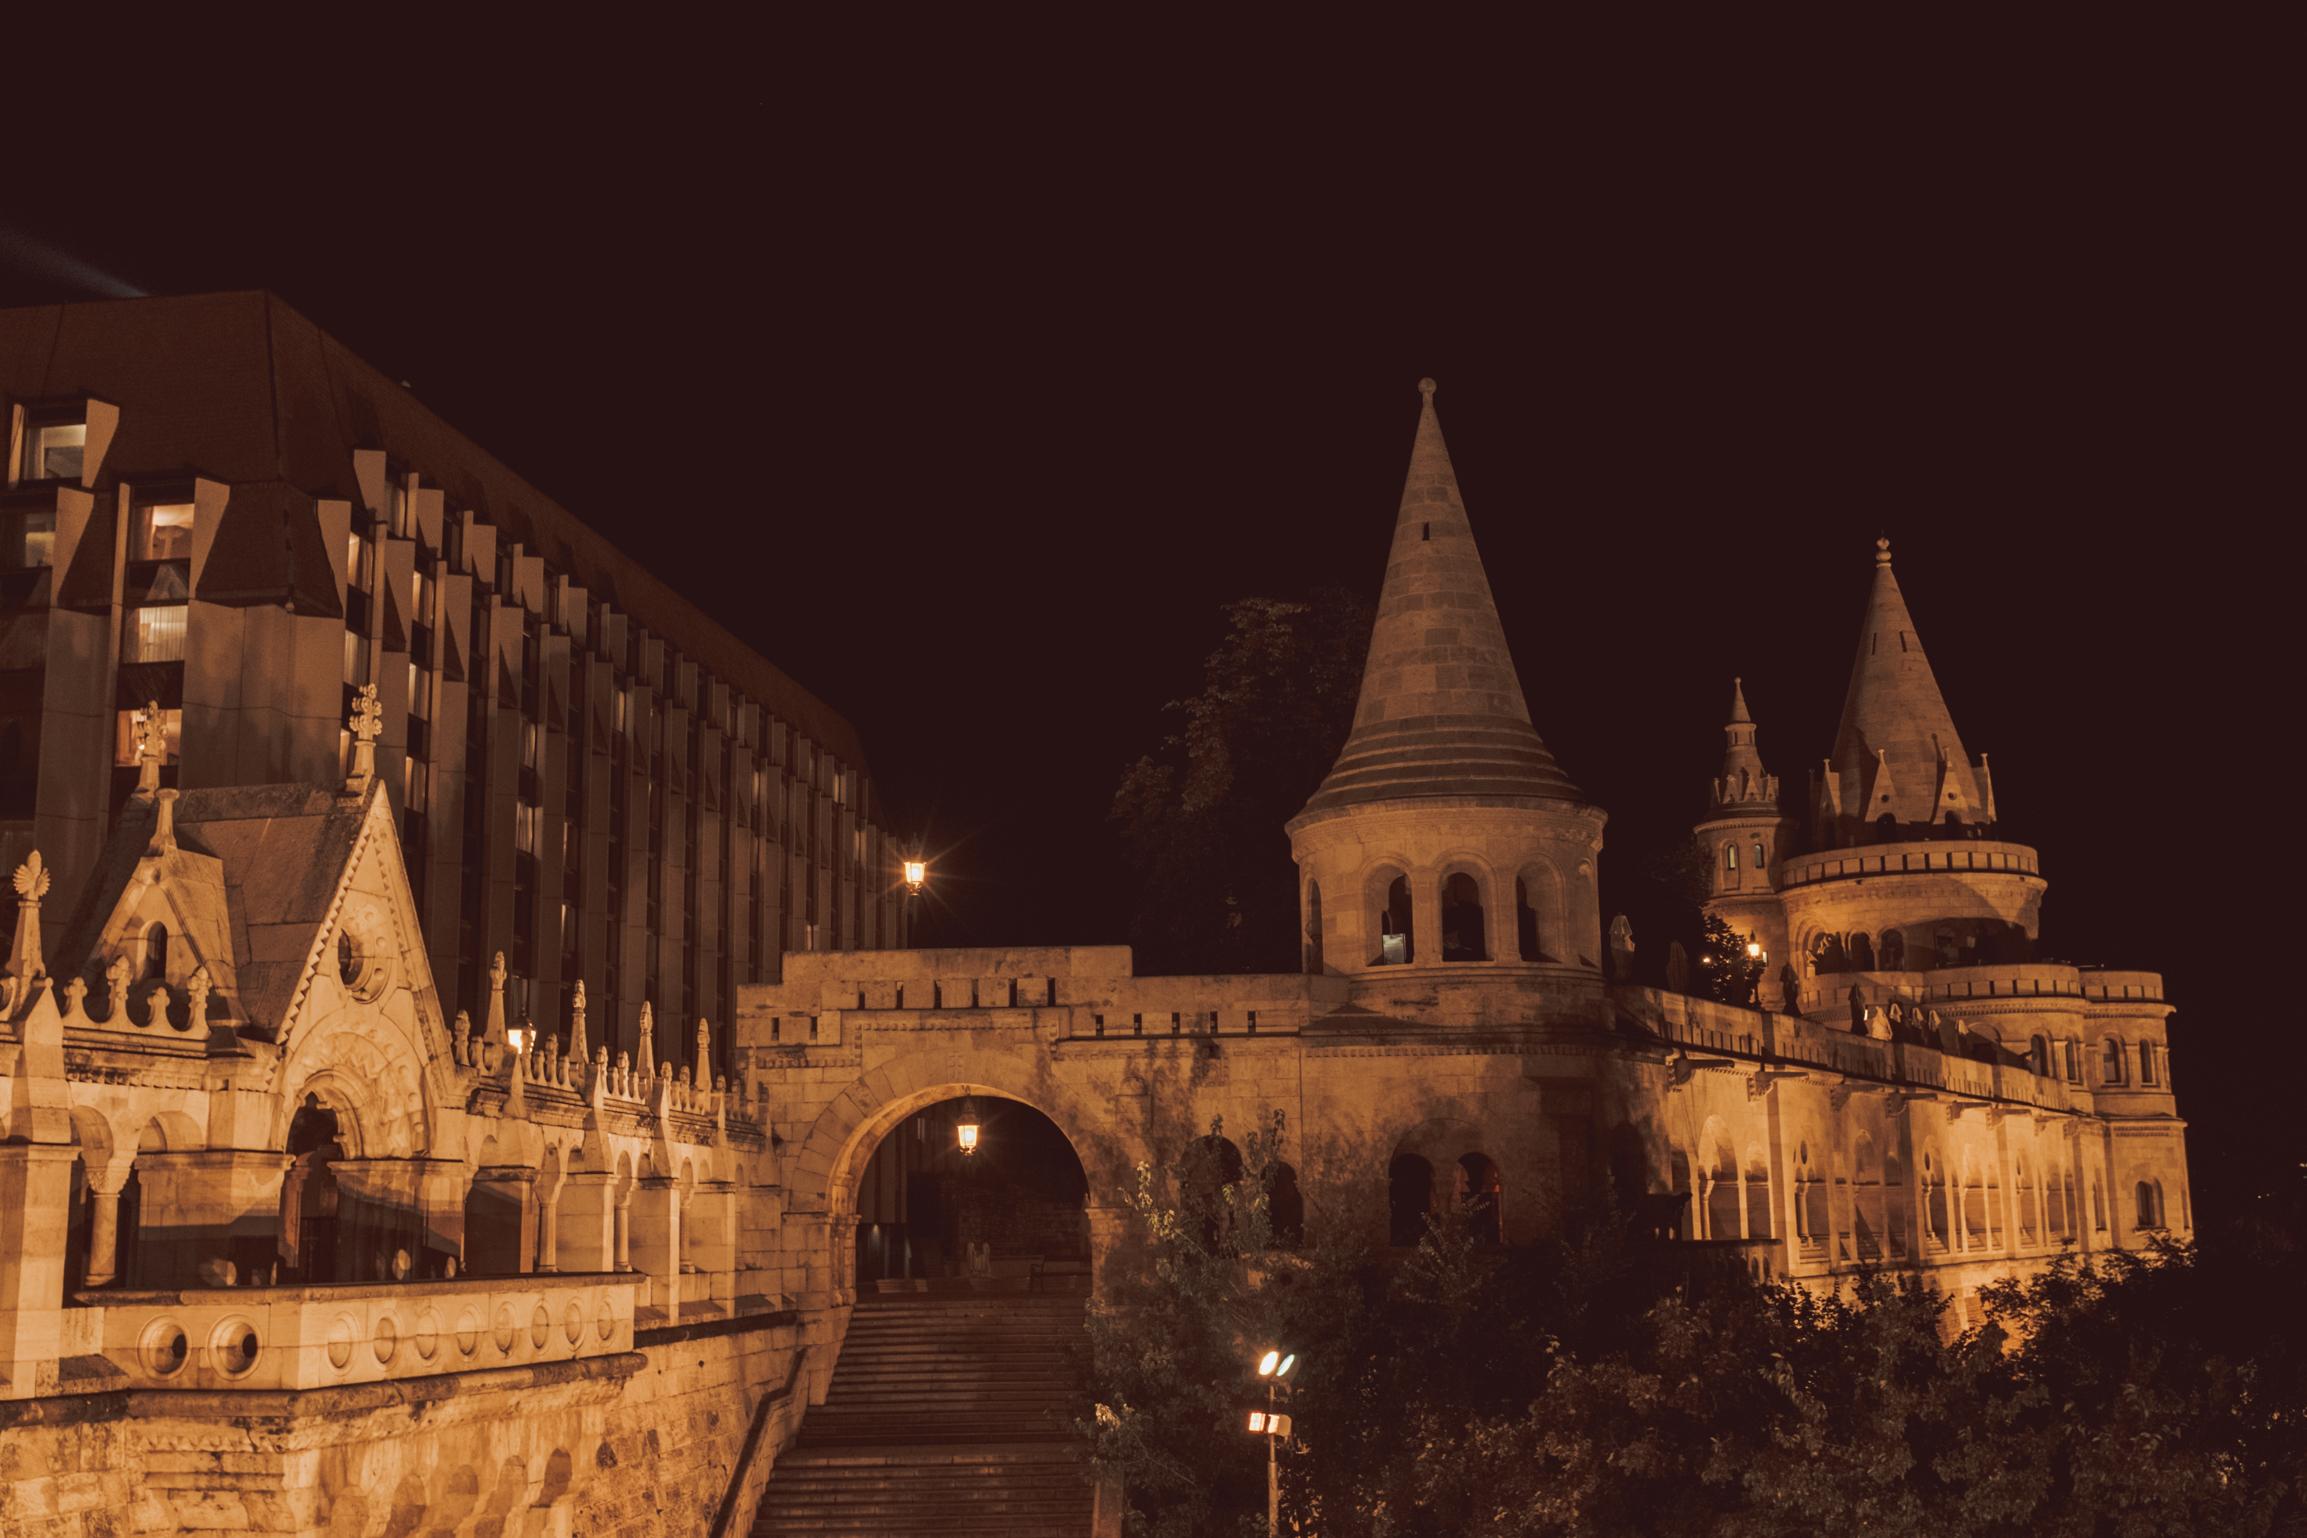 várkert bazár Budapest, Hngary